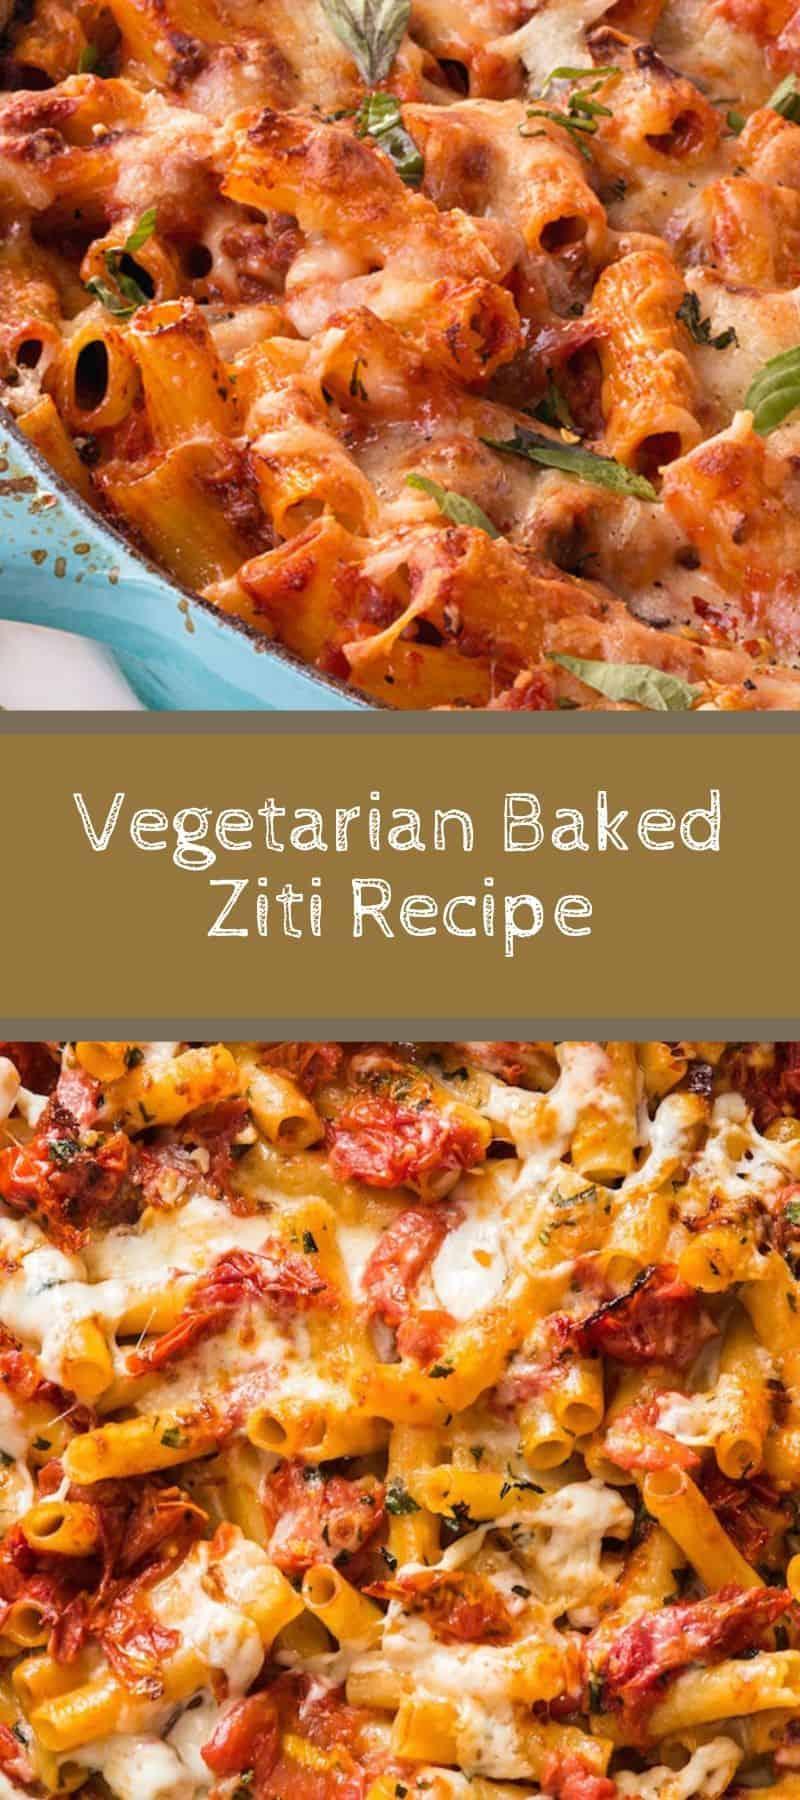 Vegetarian Baked Ziti Recipe 3